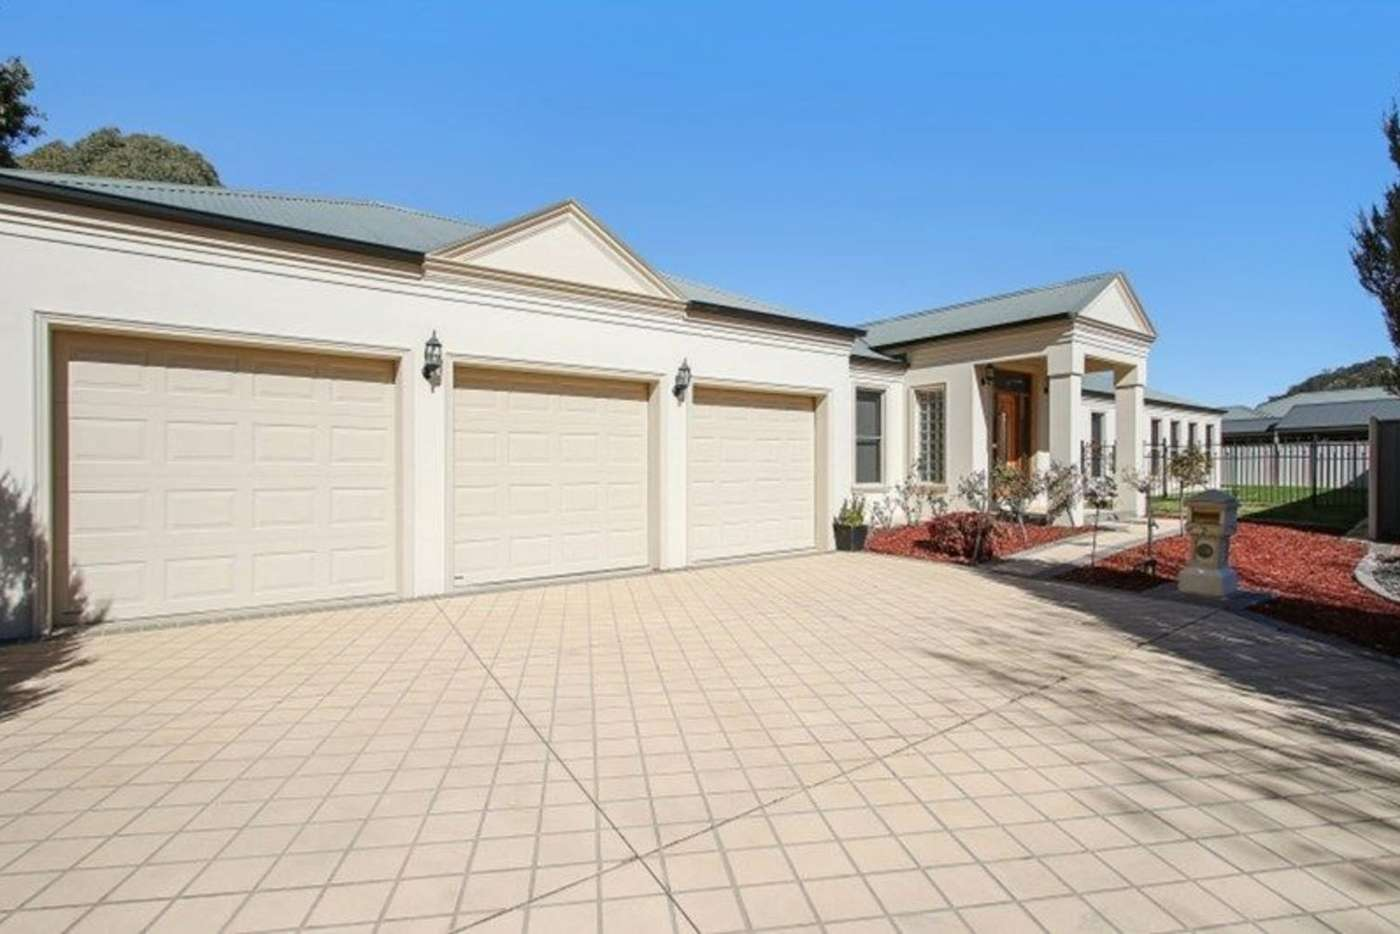 Main view of Homely house listing, 7 Cromer Fairway, Wodonga VIC 3690